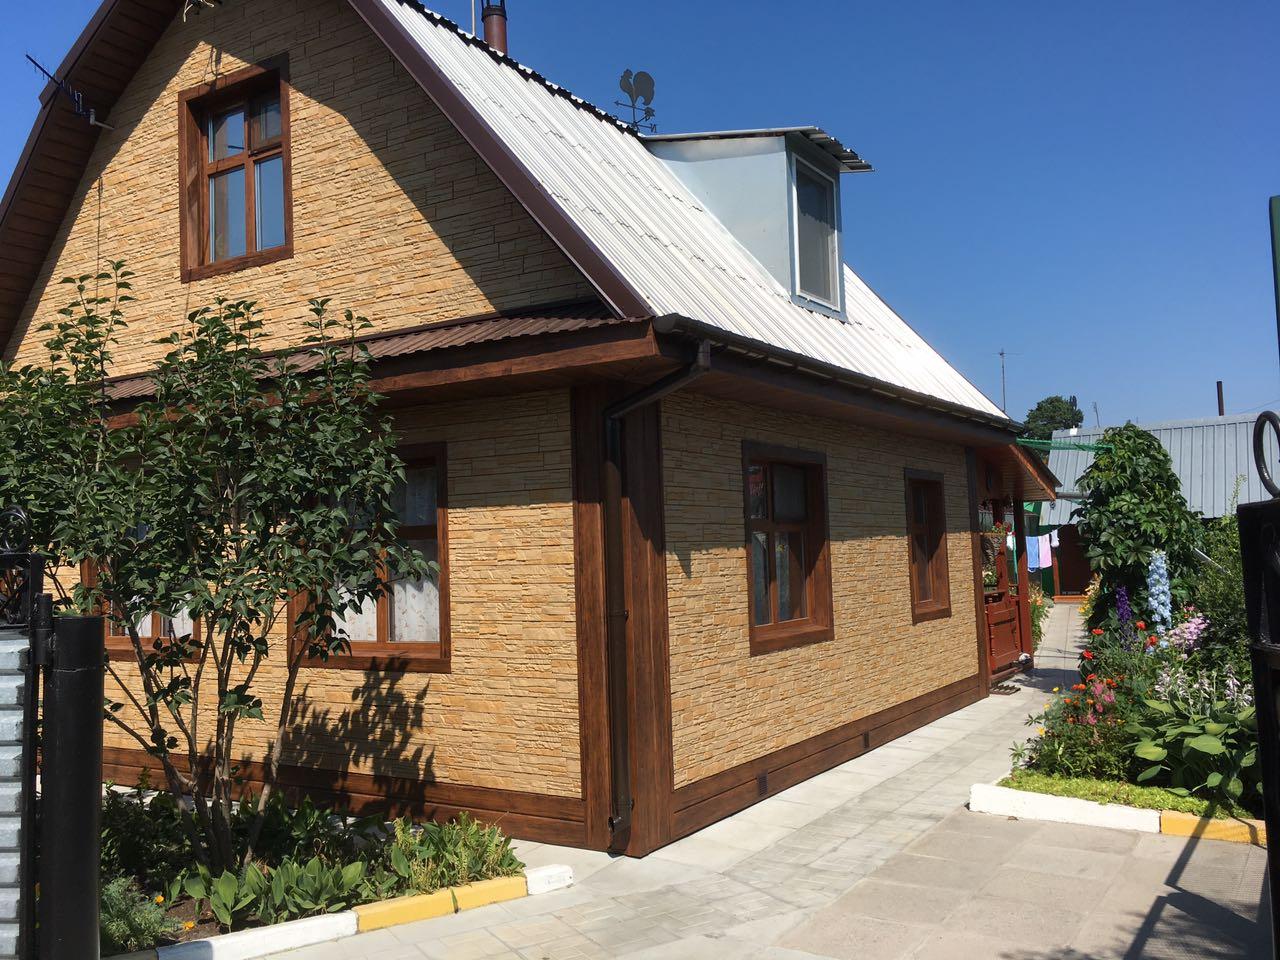 Фасад дома и гаража.